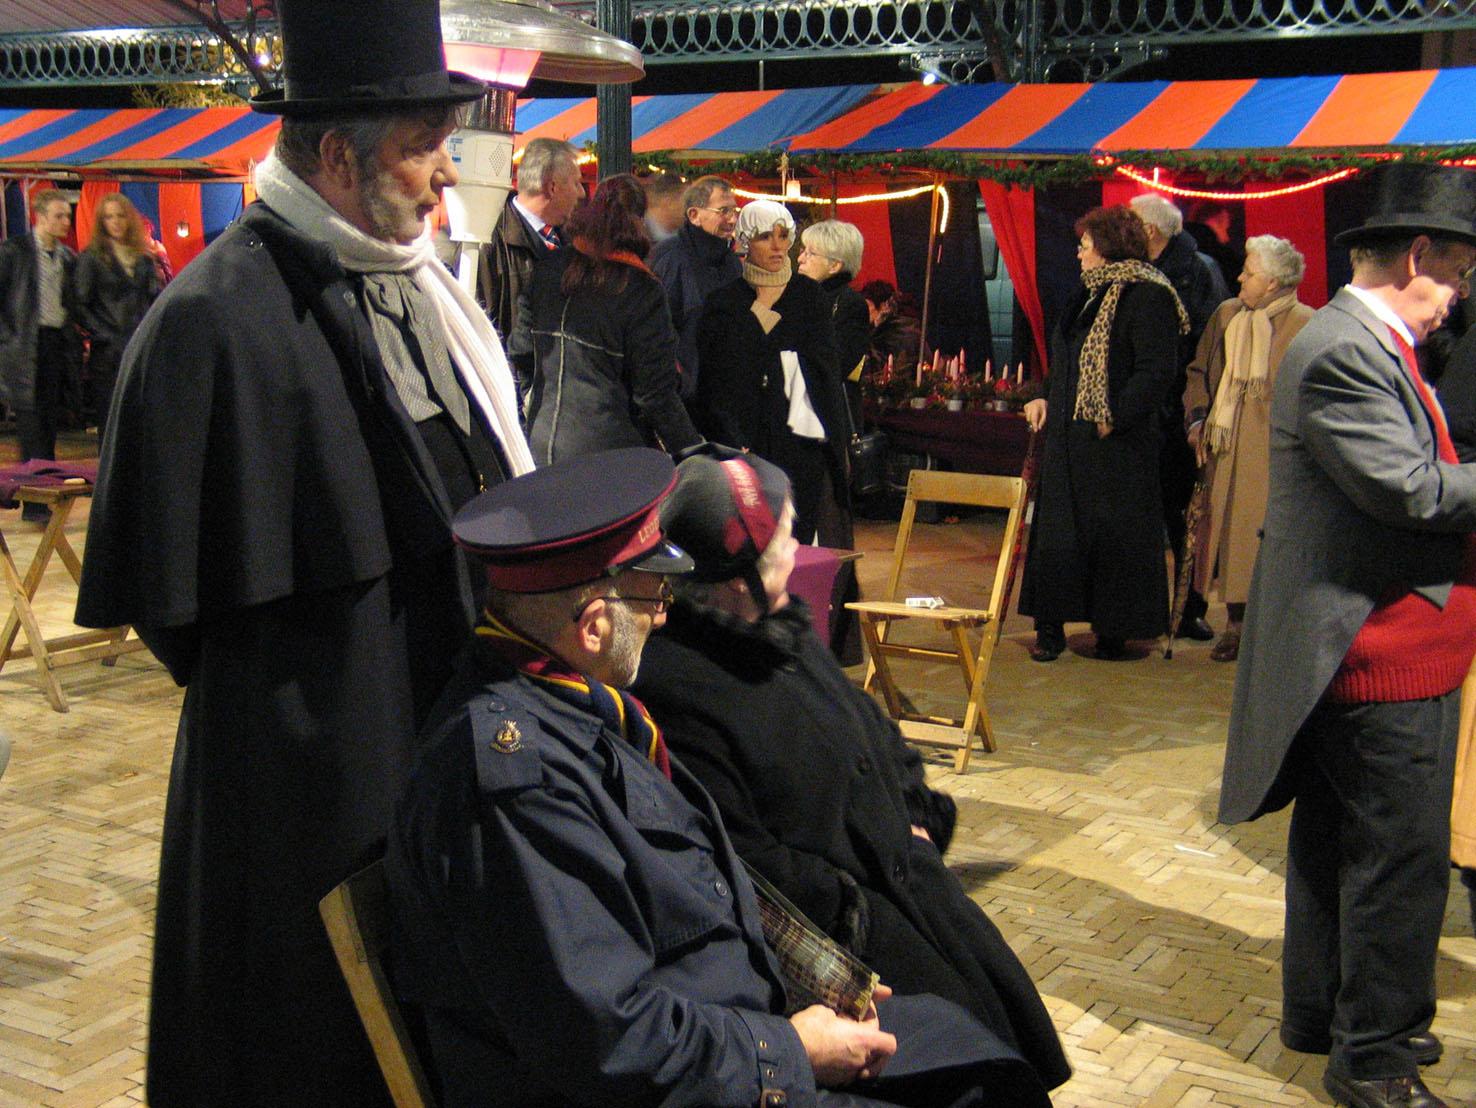 146 - Kerstmarkt Helmond 2003.jpg